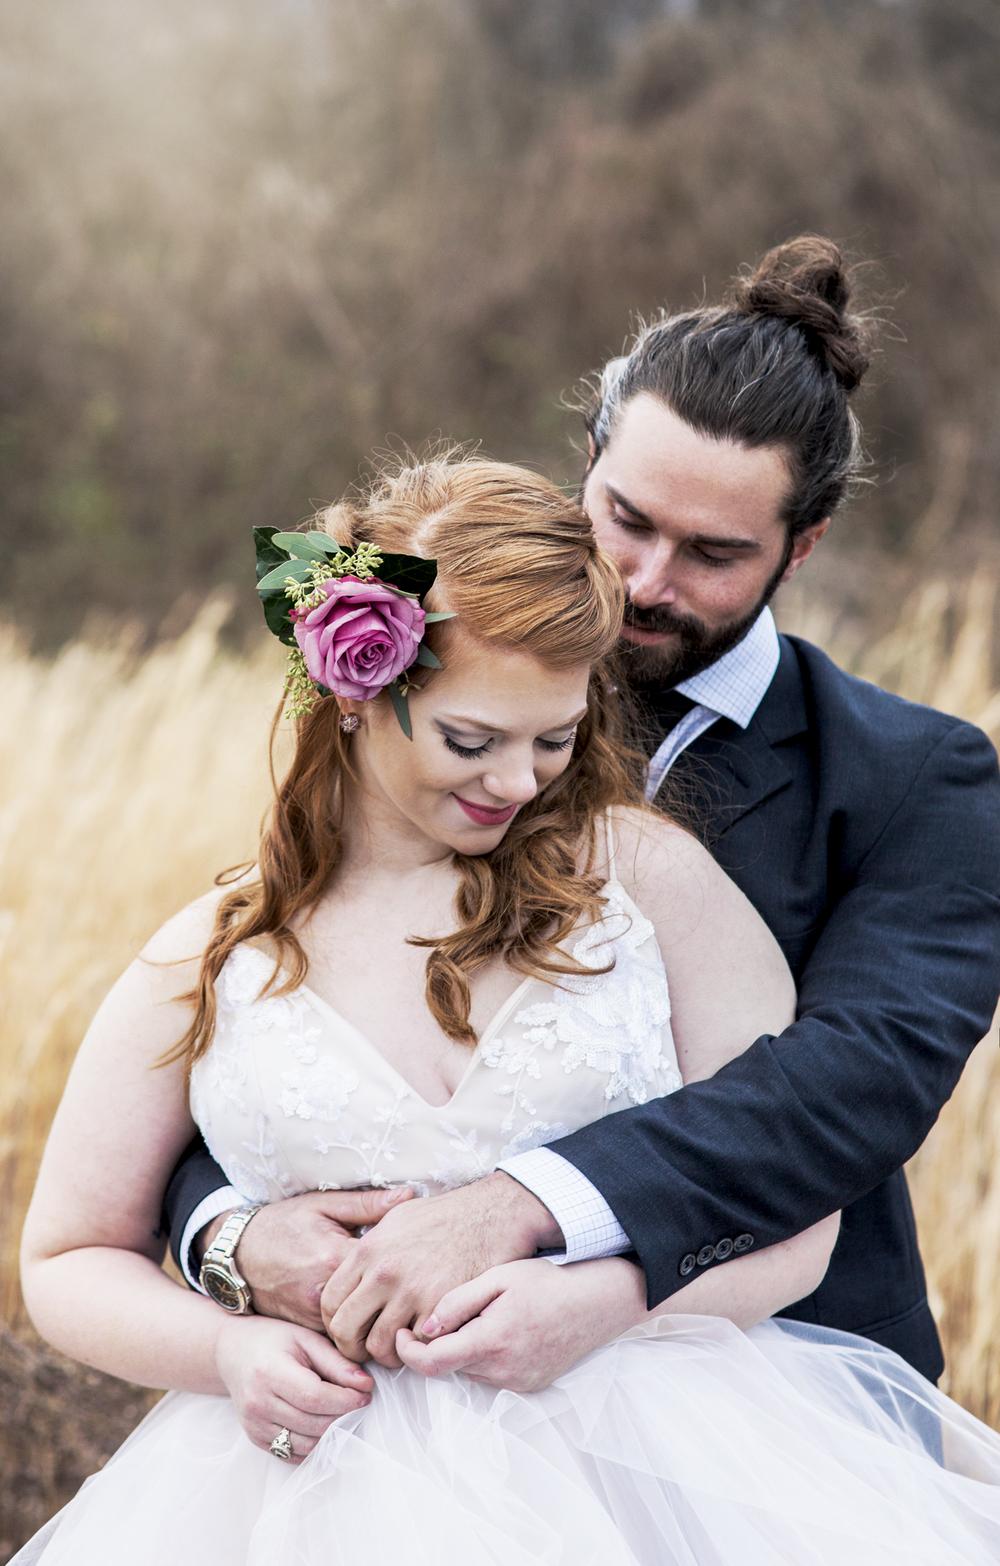 Sara + Matt + Ella _Give Back Bride_Styled Wedding Shoot _K. Stoddard Photography027.jpg